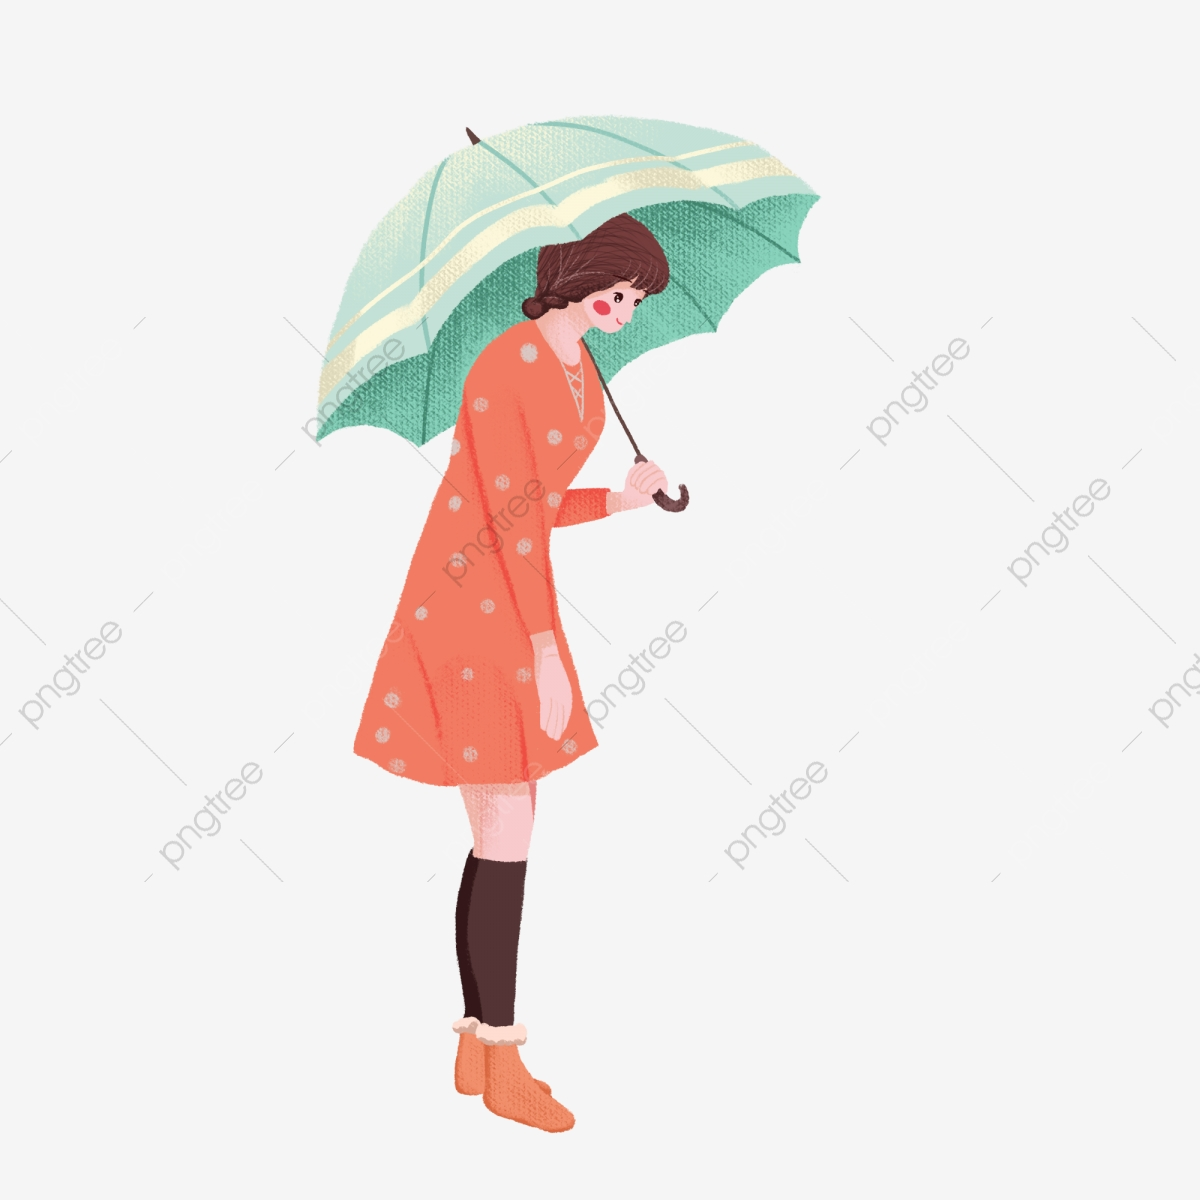 Winter Rain Rainy Day Rainy Season Umbrella Girl Umbrella Girl